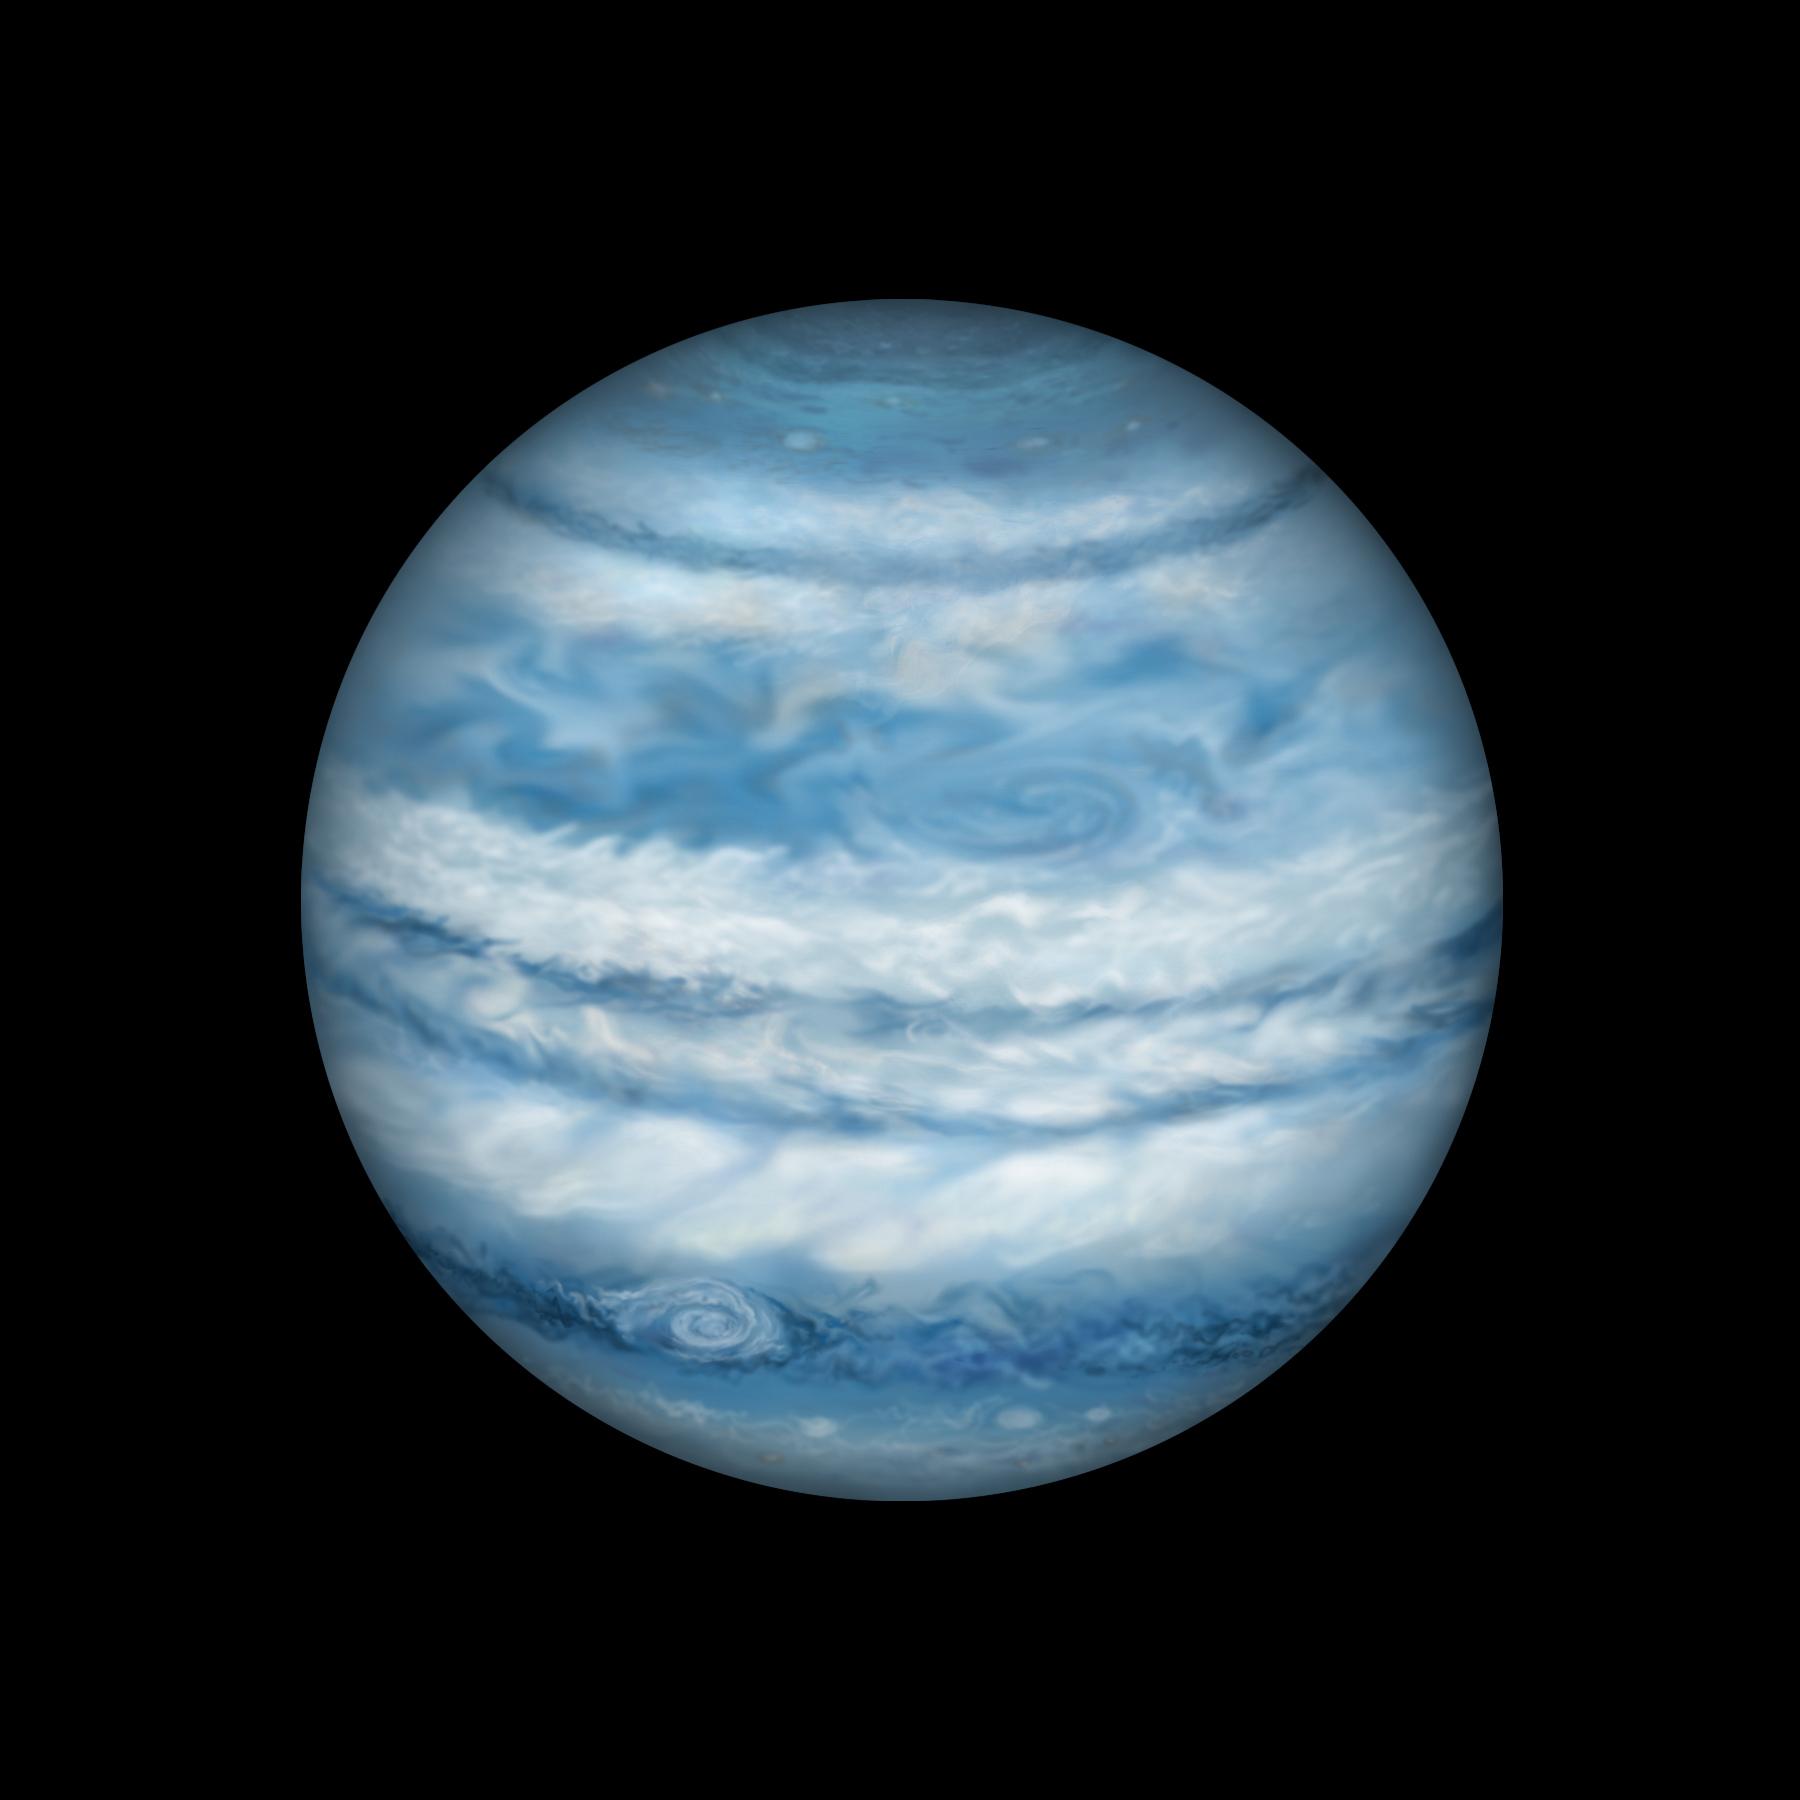 exoplanet landscape orbiting giant planet - photo #23